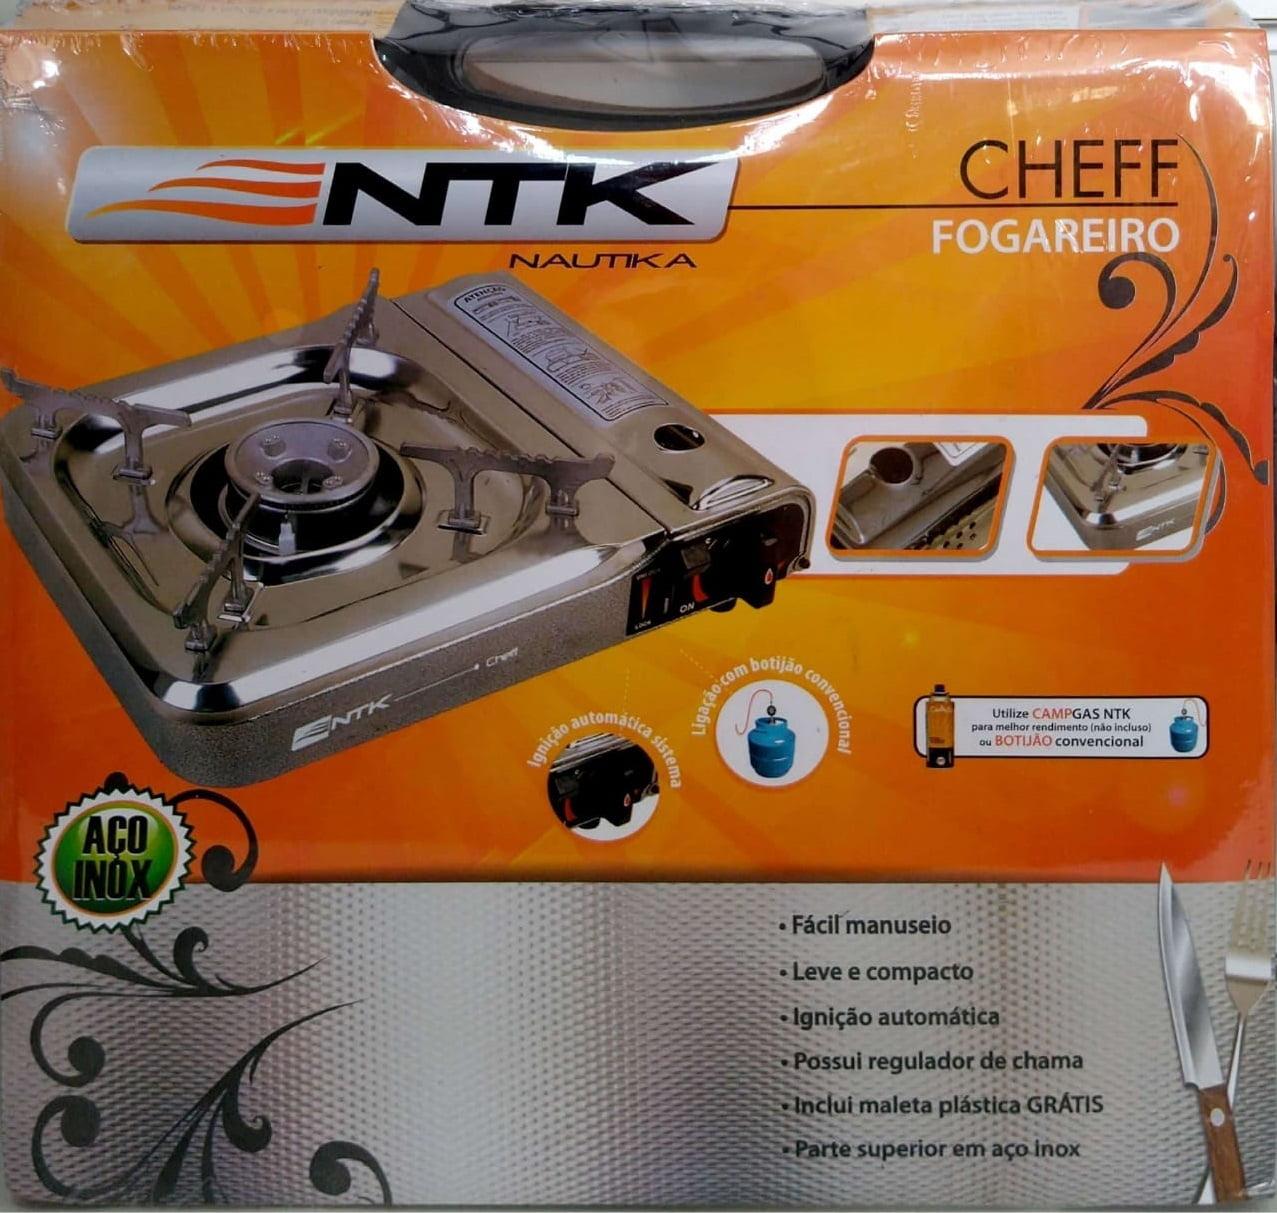 Fogareiro Cheff Inox - Nautika